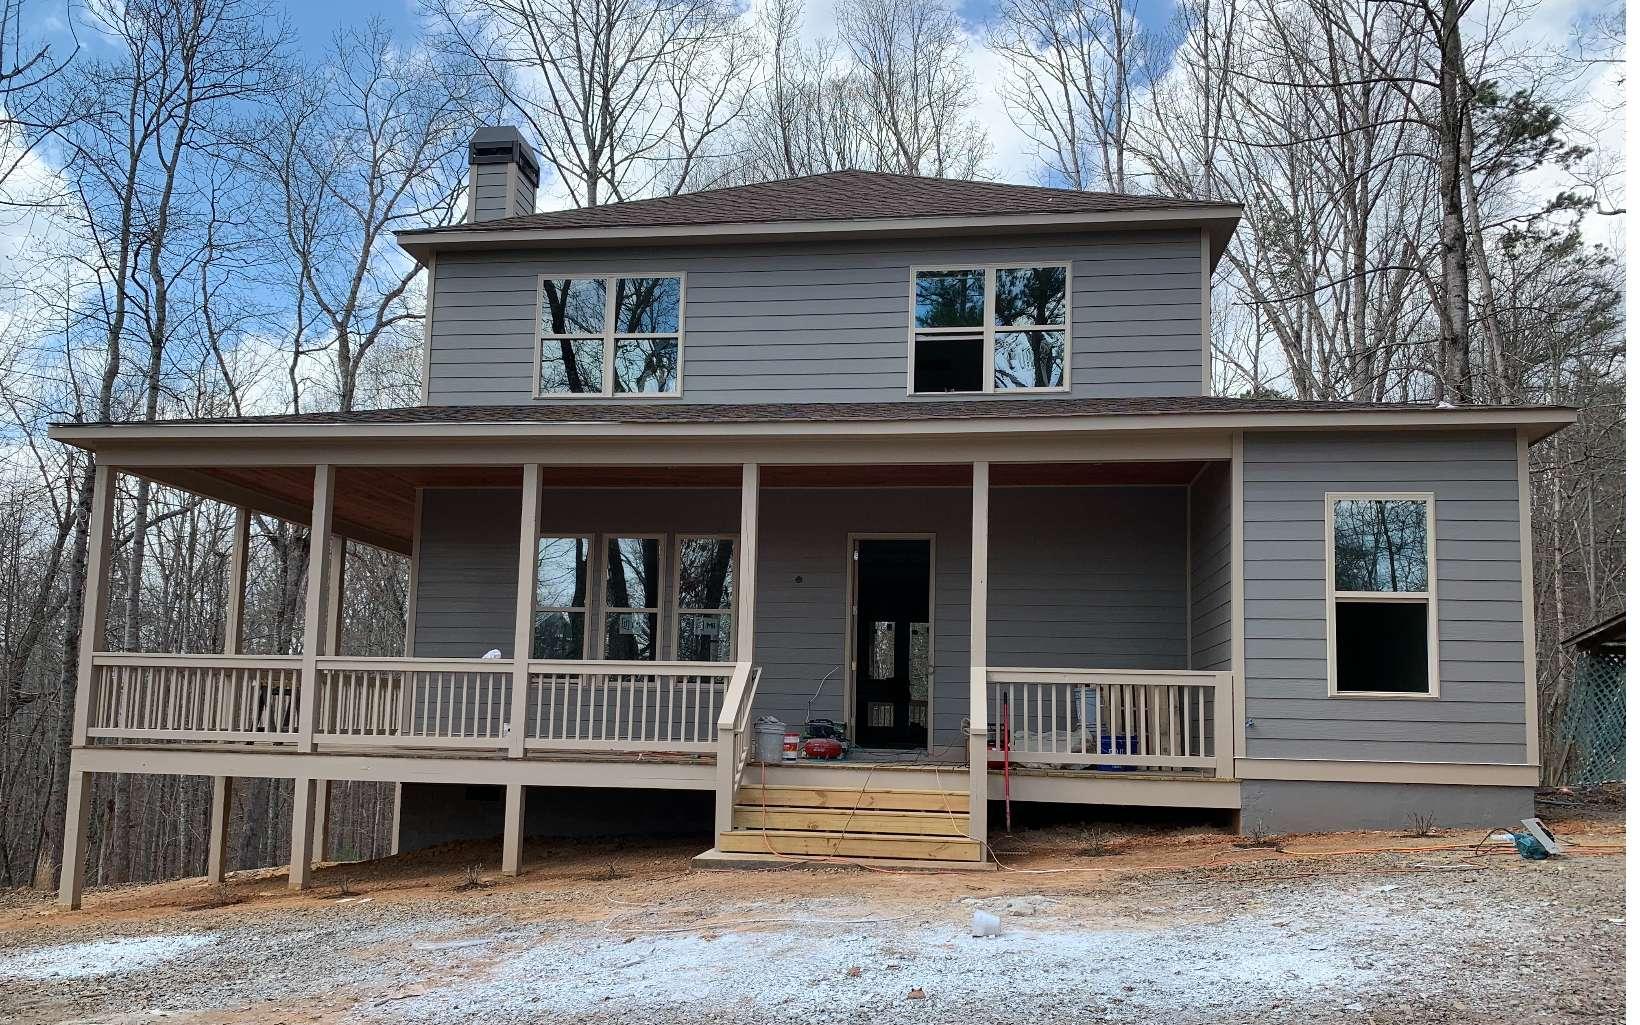 1734 NEWPORT DRIVE, Ellijay, Georgia 30540, 3 Bedrooms Bedrooms, ,3 BathroomsBathrooms,Single Family,For Sale,1734 NEWPORT DRIVE,2,305434